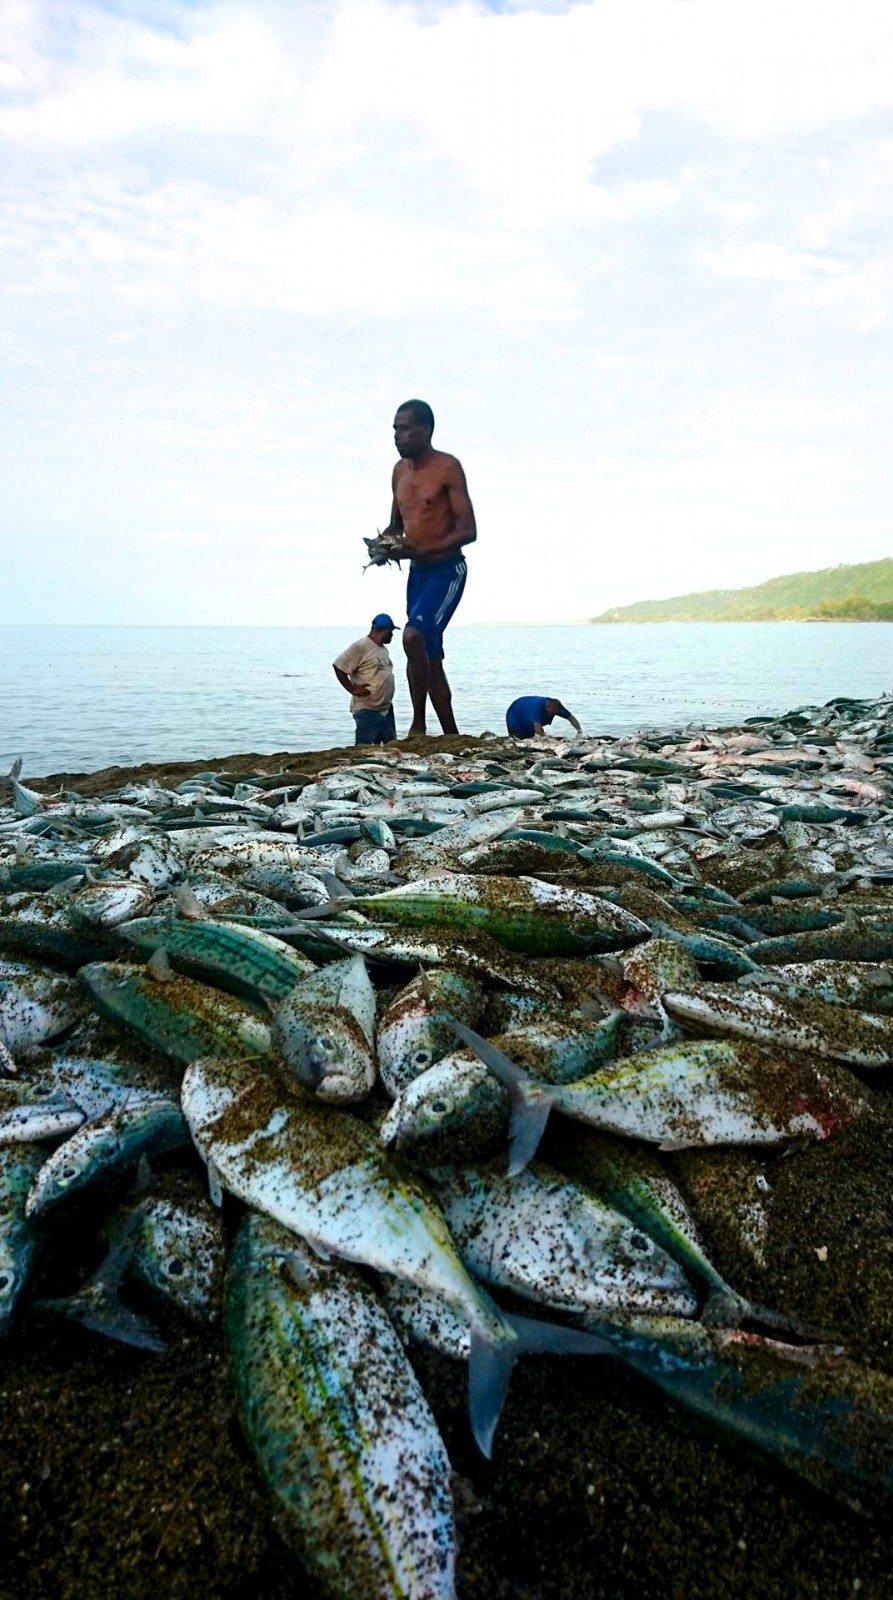 netfishingblacksands